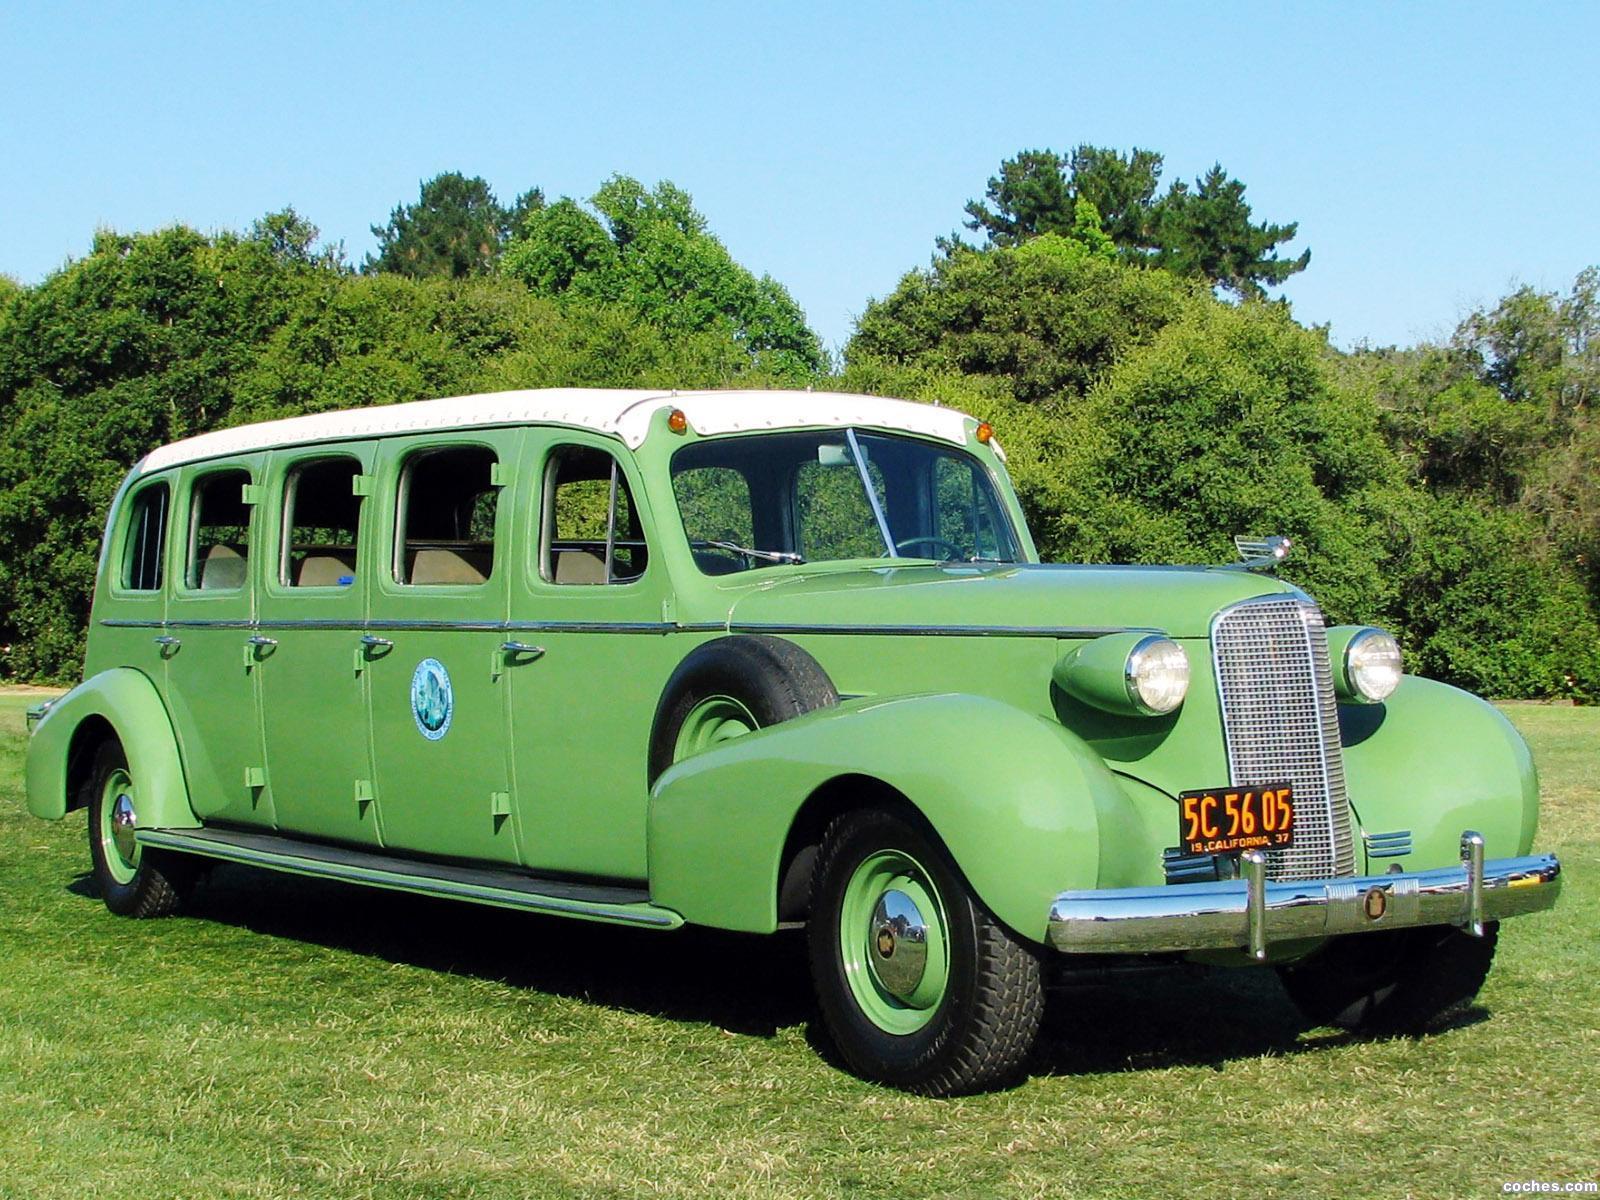 Foto 0 de Cadillac V8 Series 37 75 Sightseeing Bus 1937